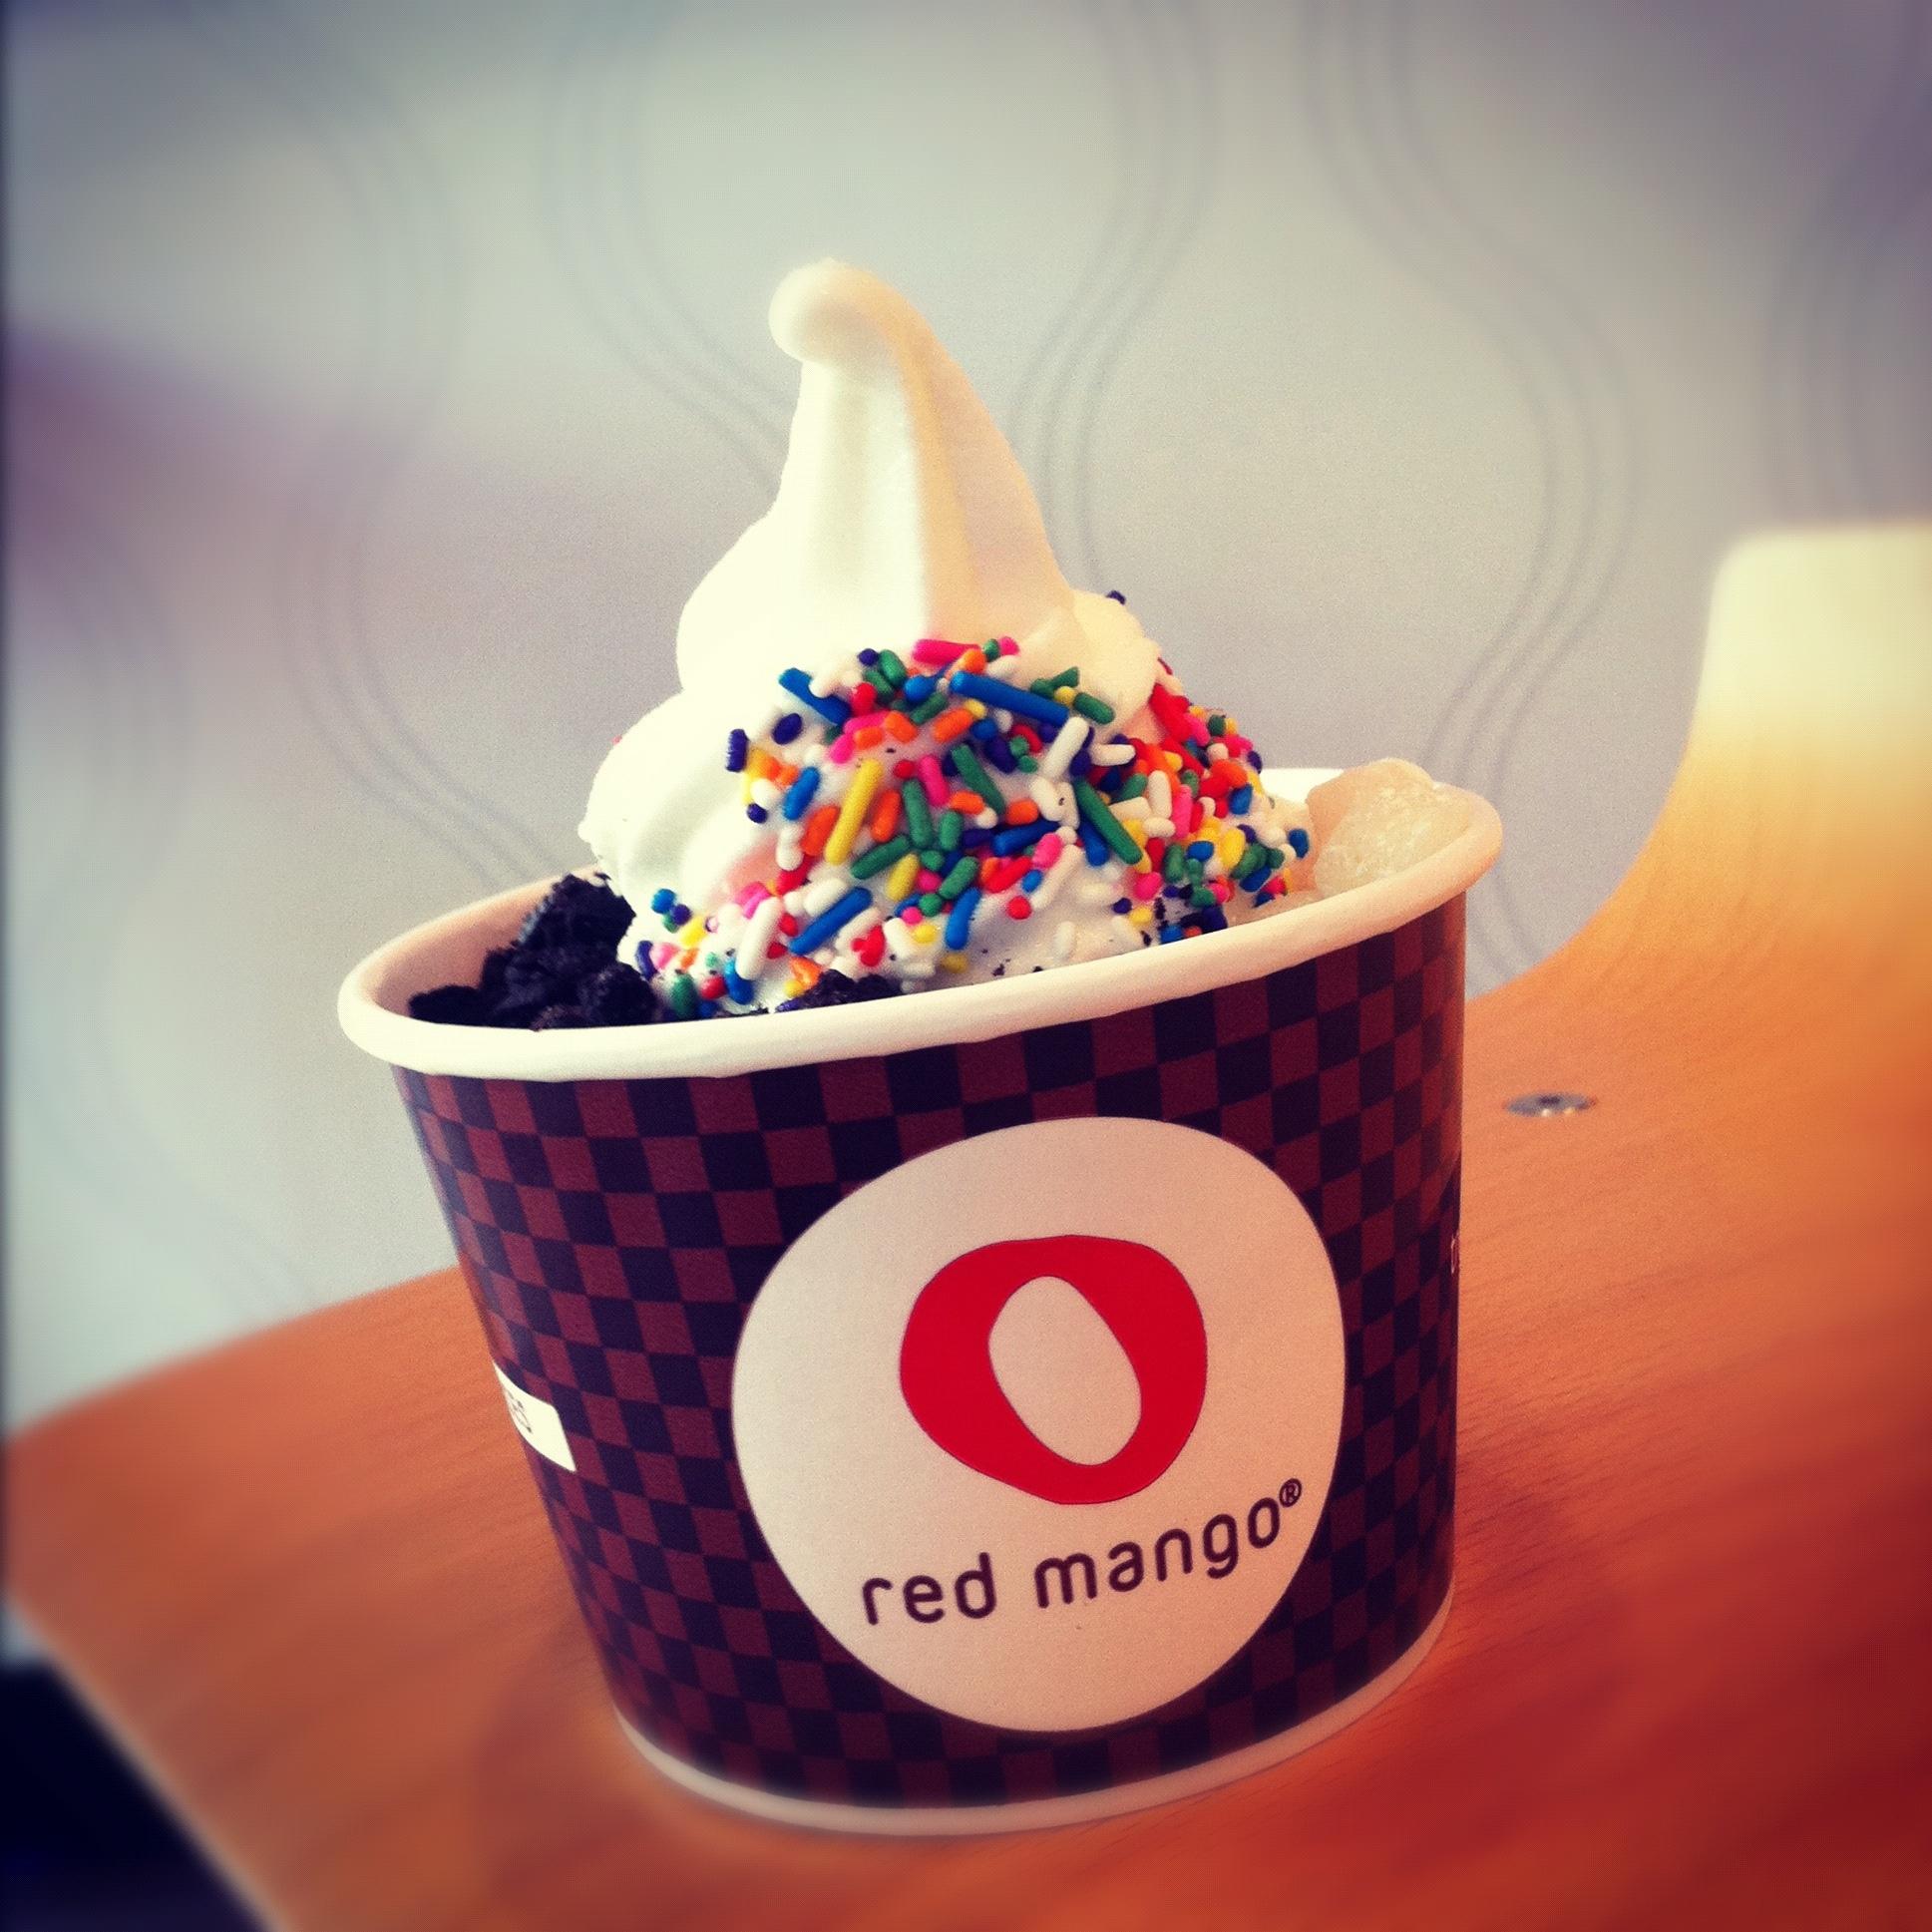 Red Mango Yogurt Cafe